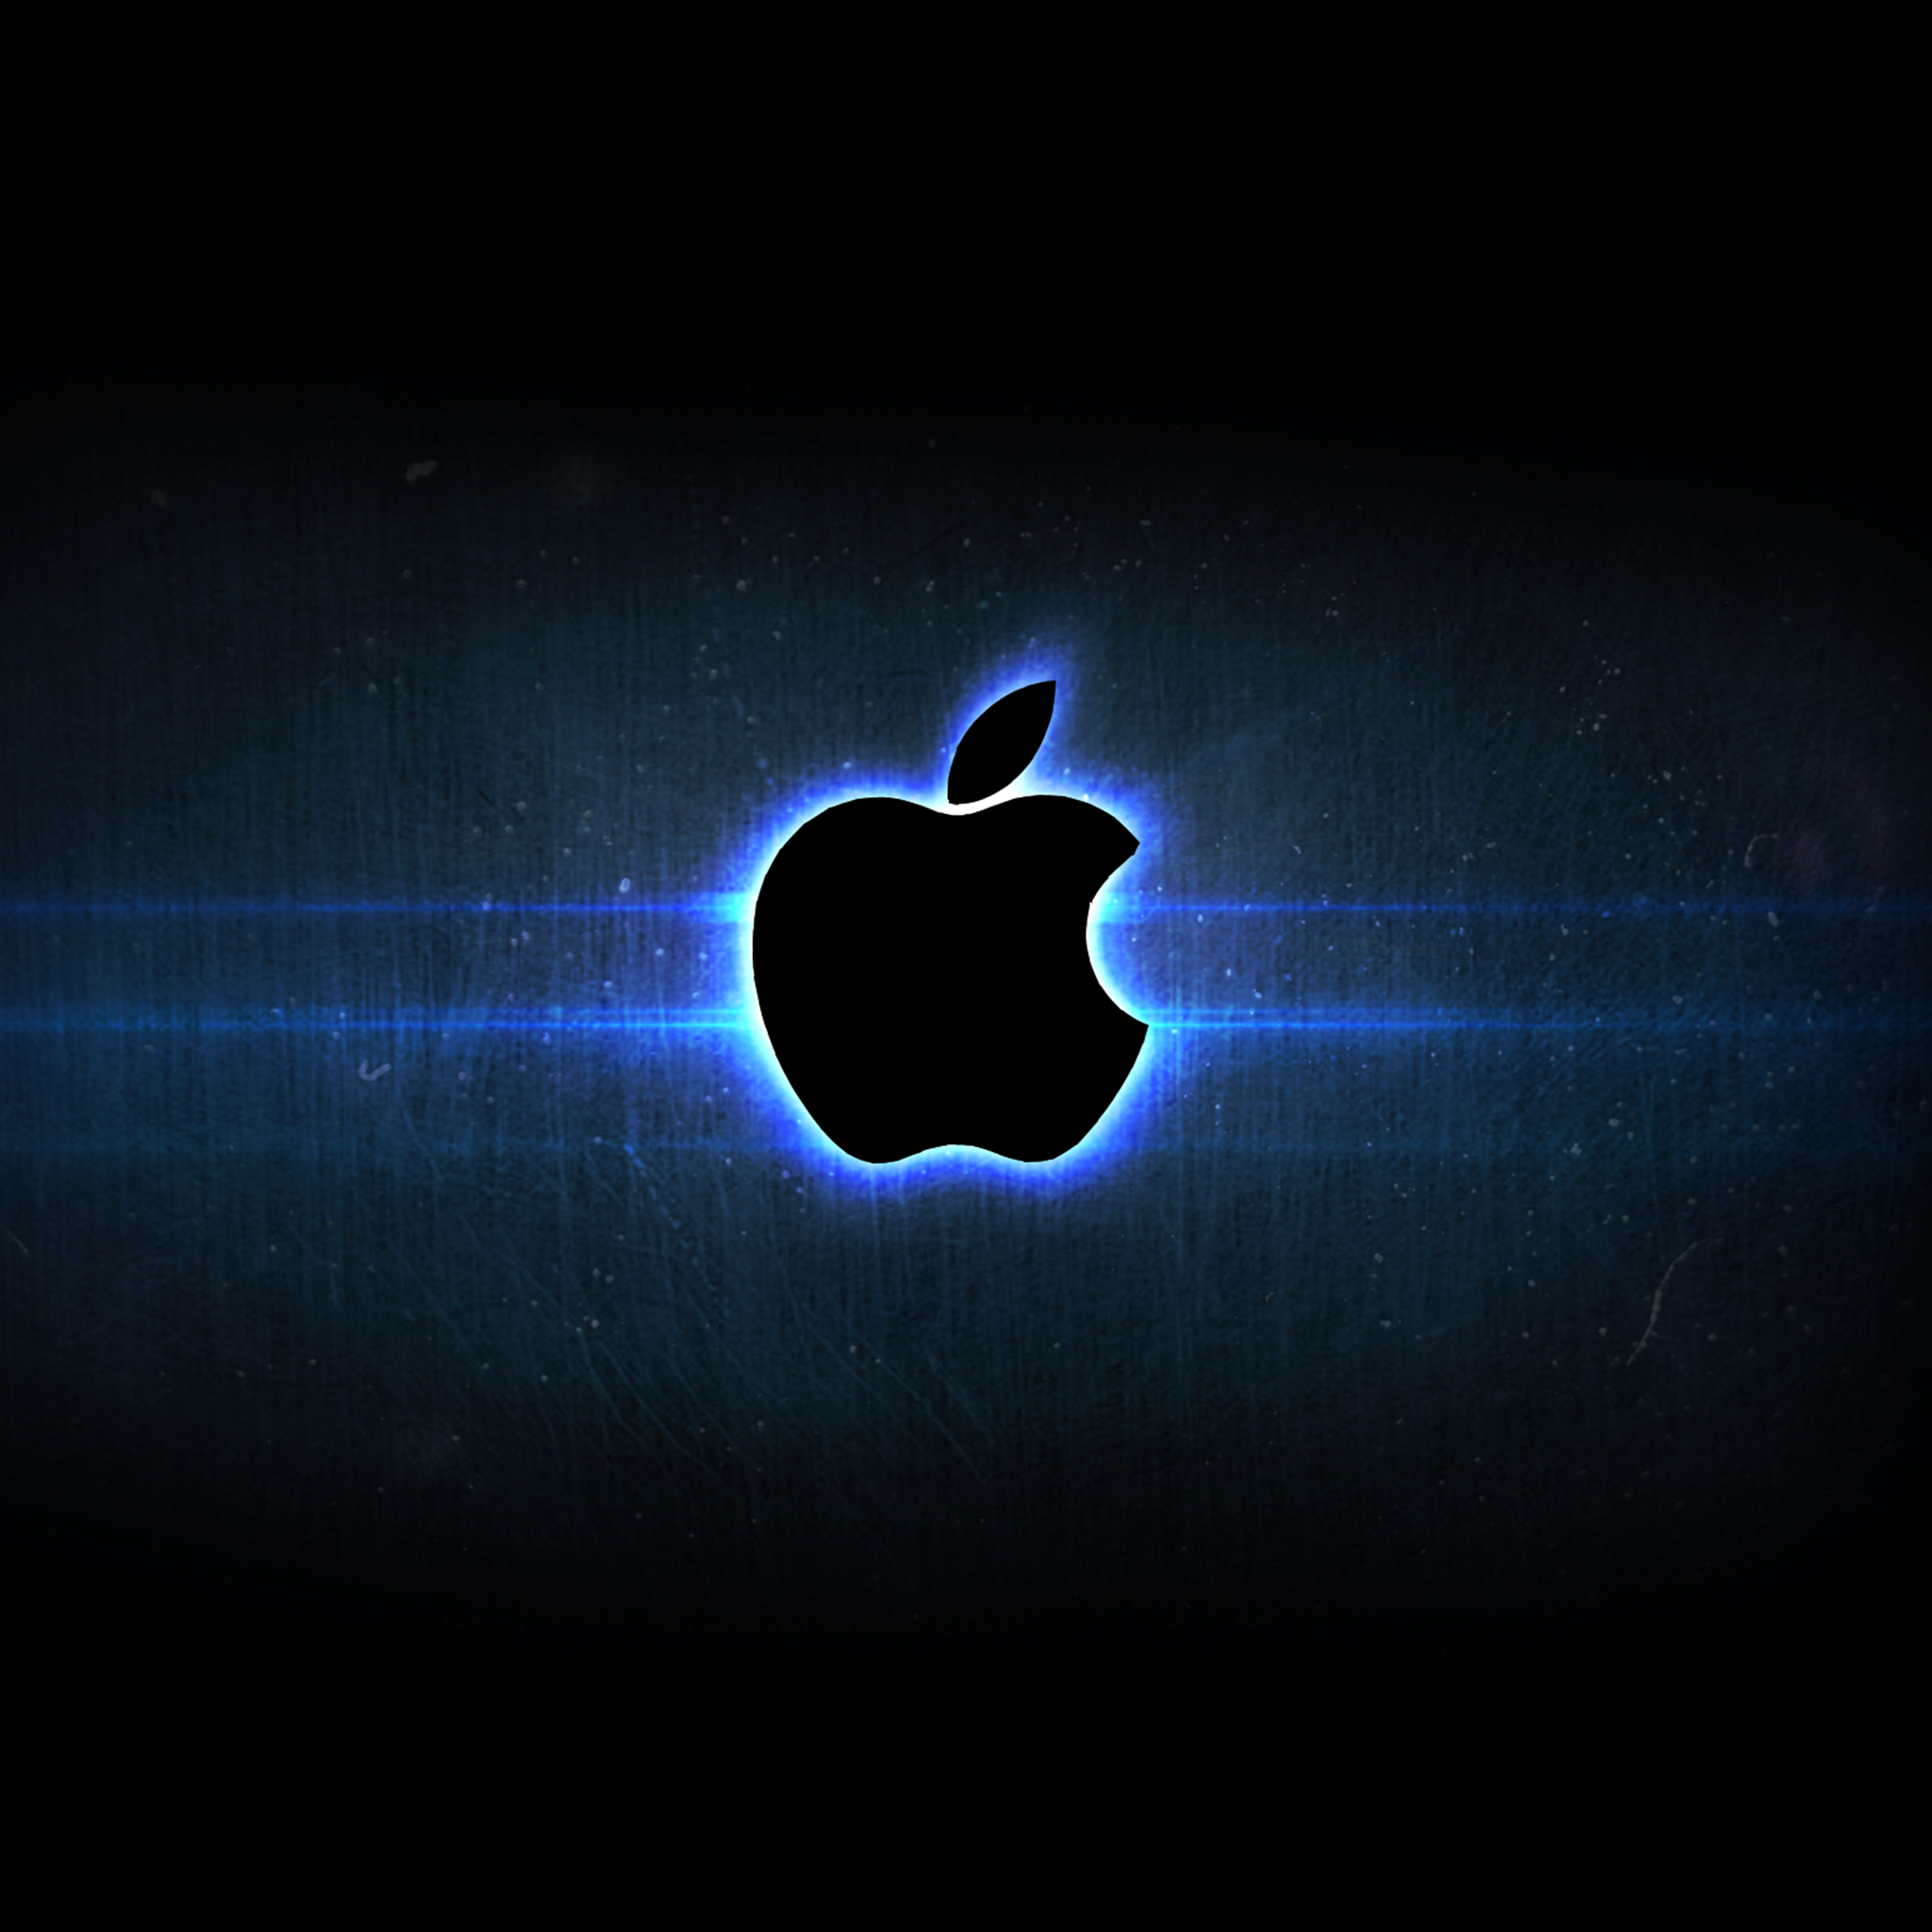 Apple Background 3Wallpapers iPad Apple Background   iPad